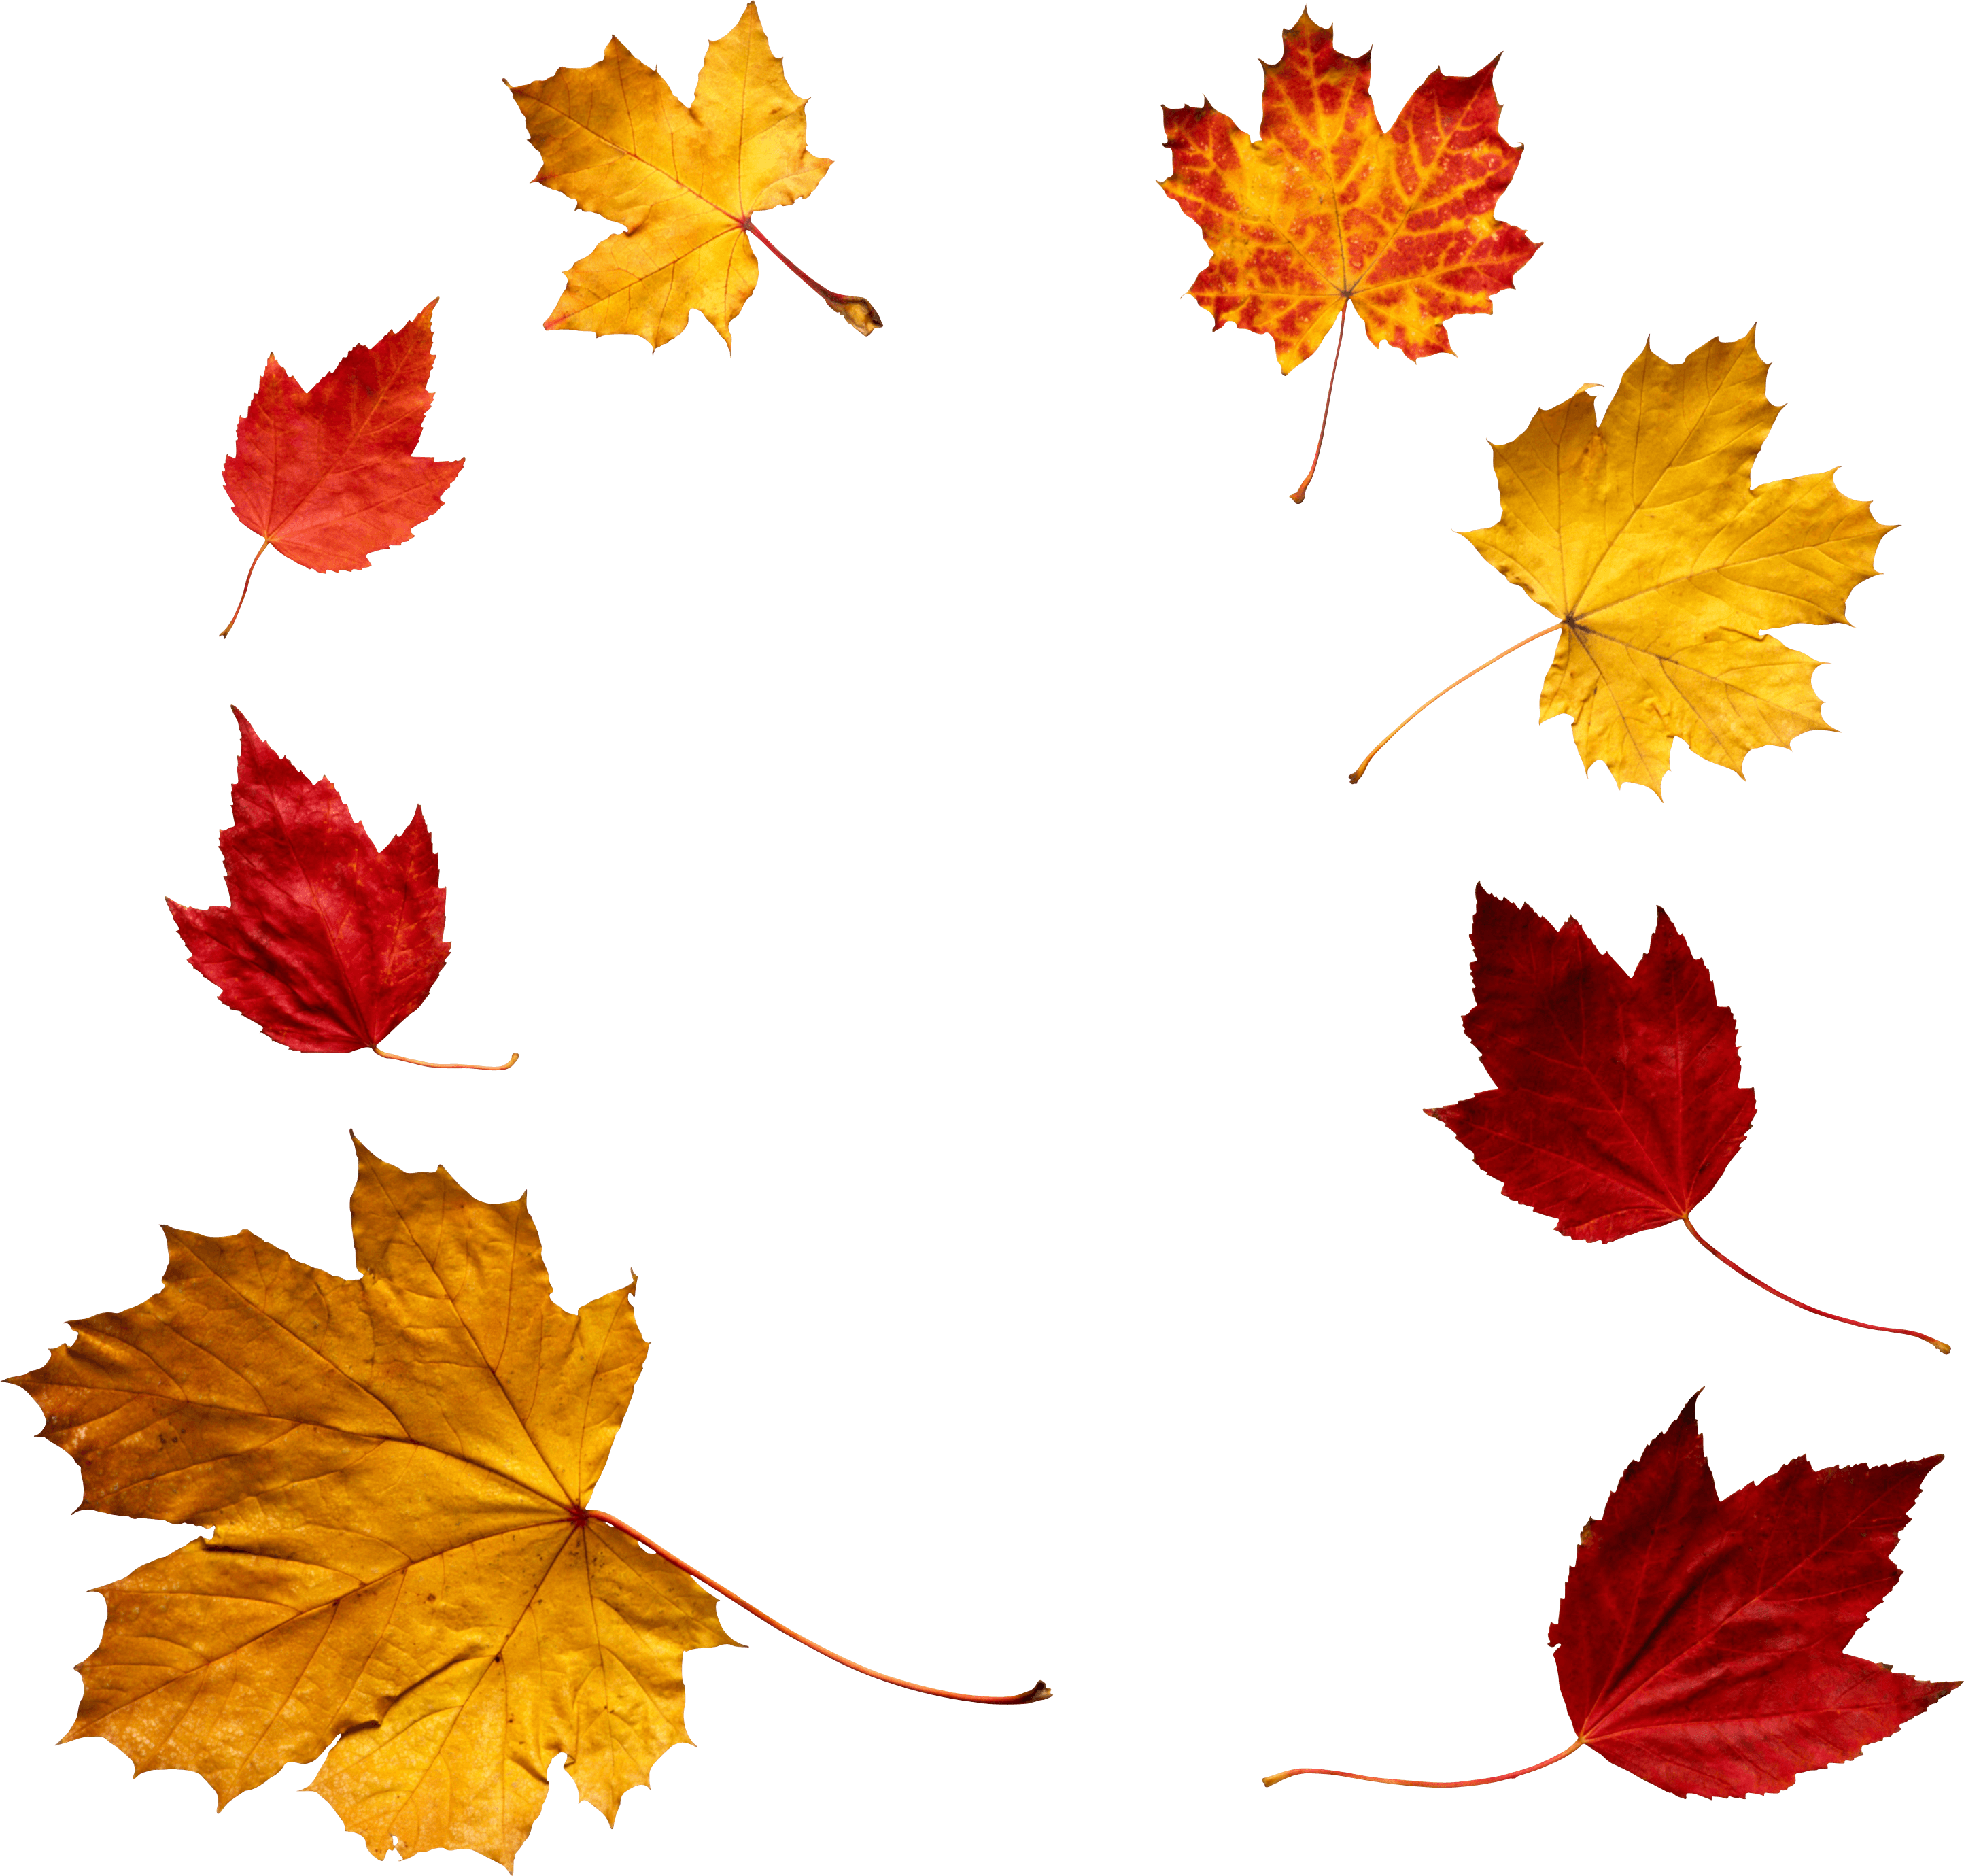 Autumn leaves transparent png. Circle clipart leaf